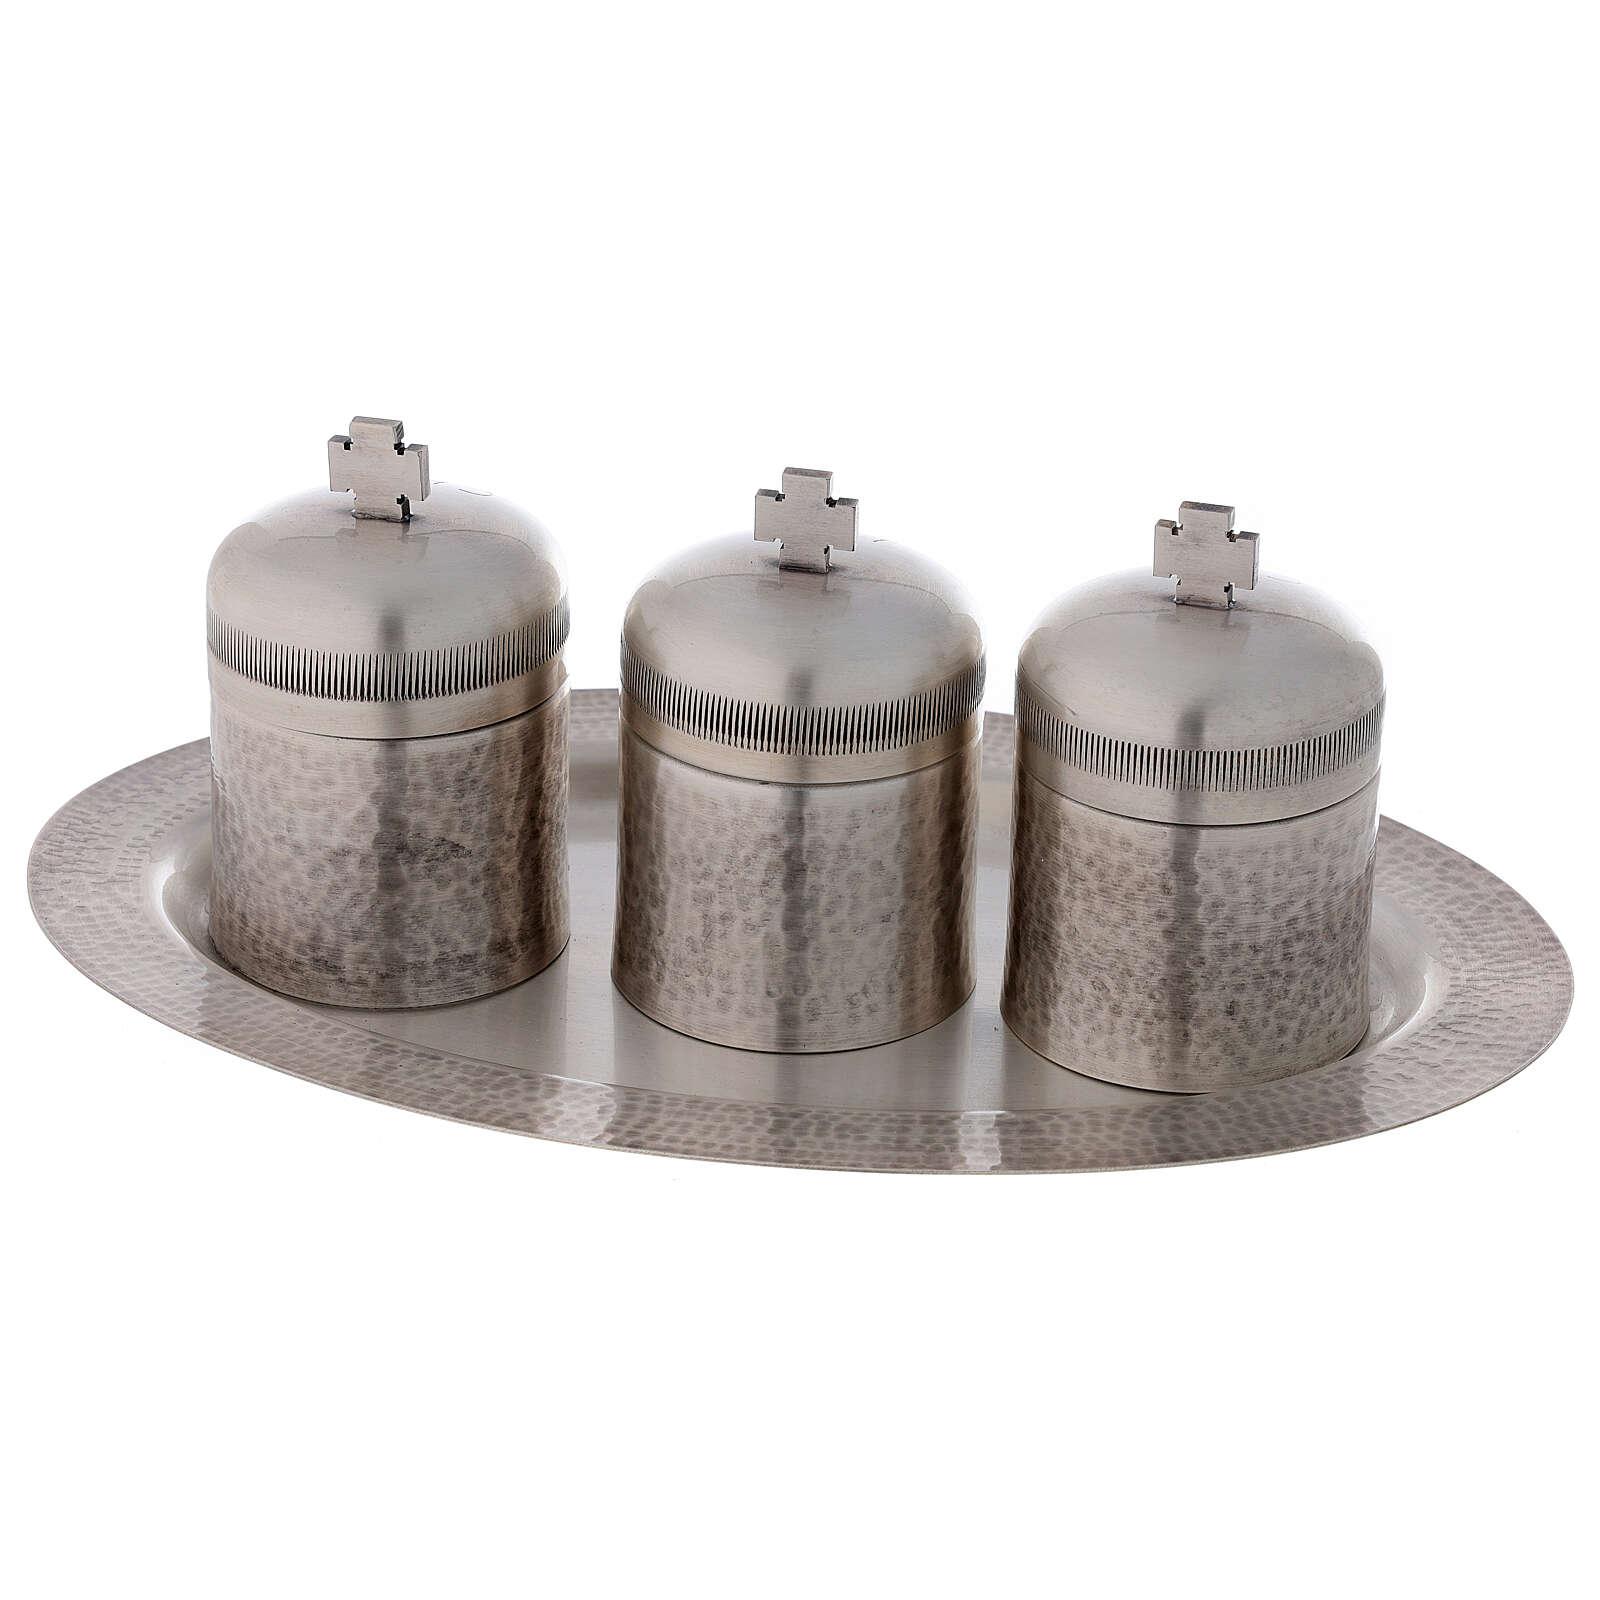 Set tríada óleos santos latón plateado 50 ml 3